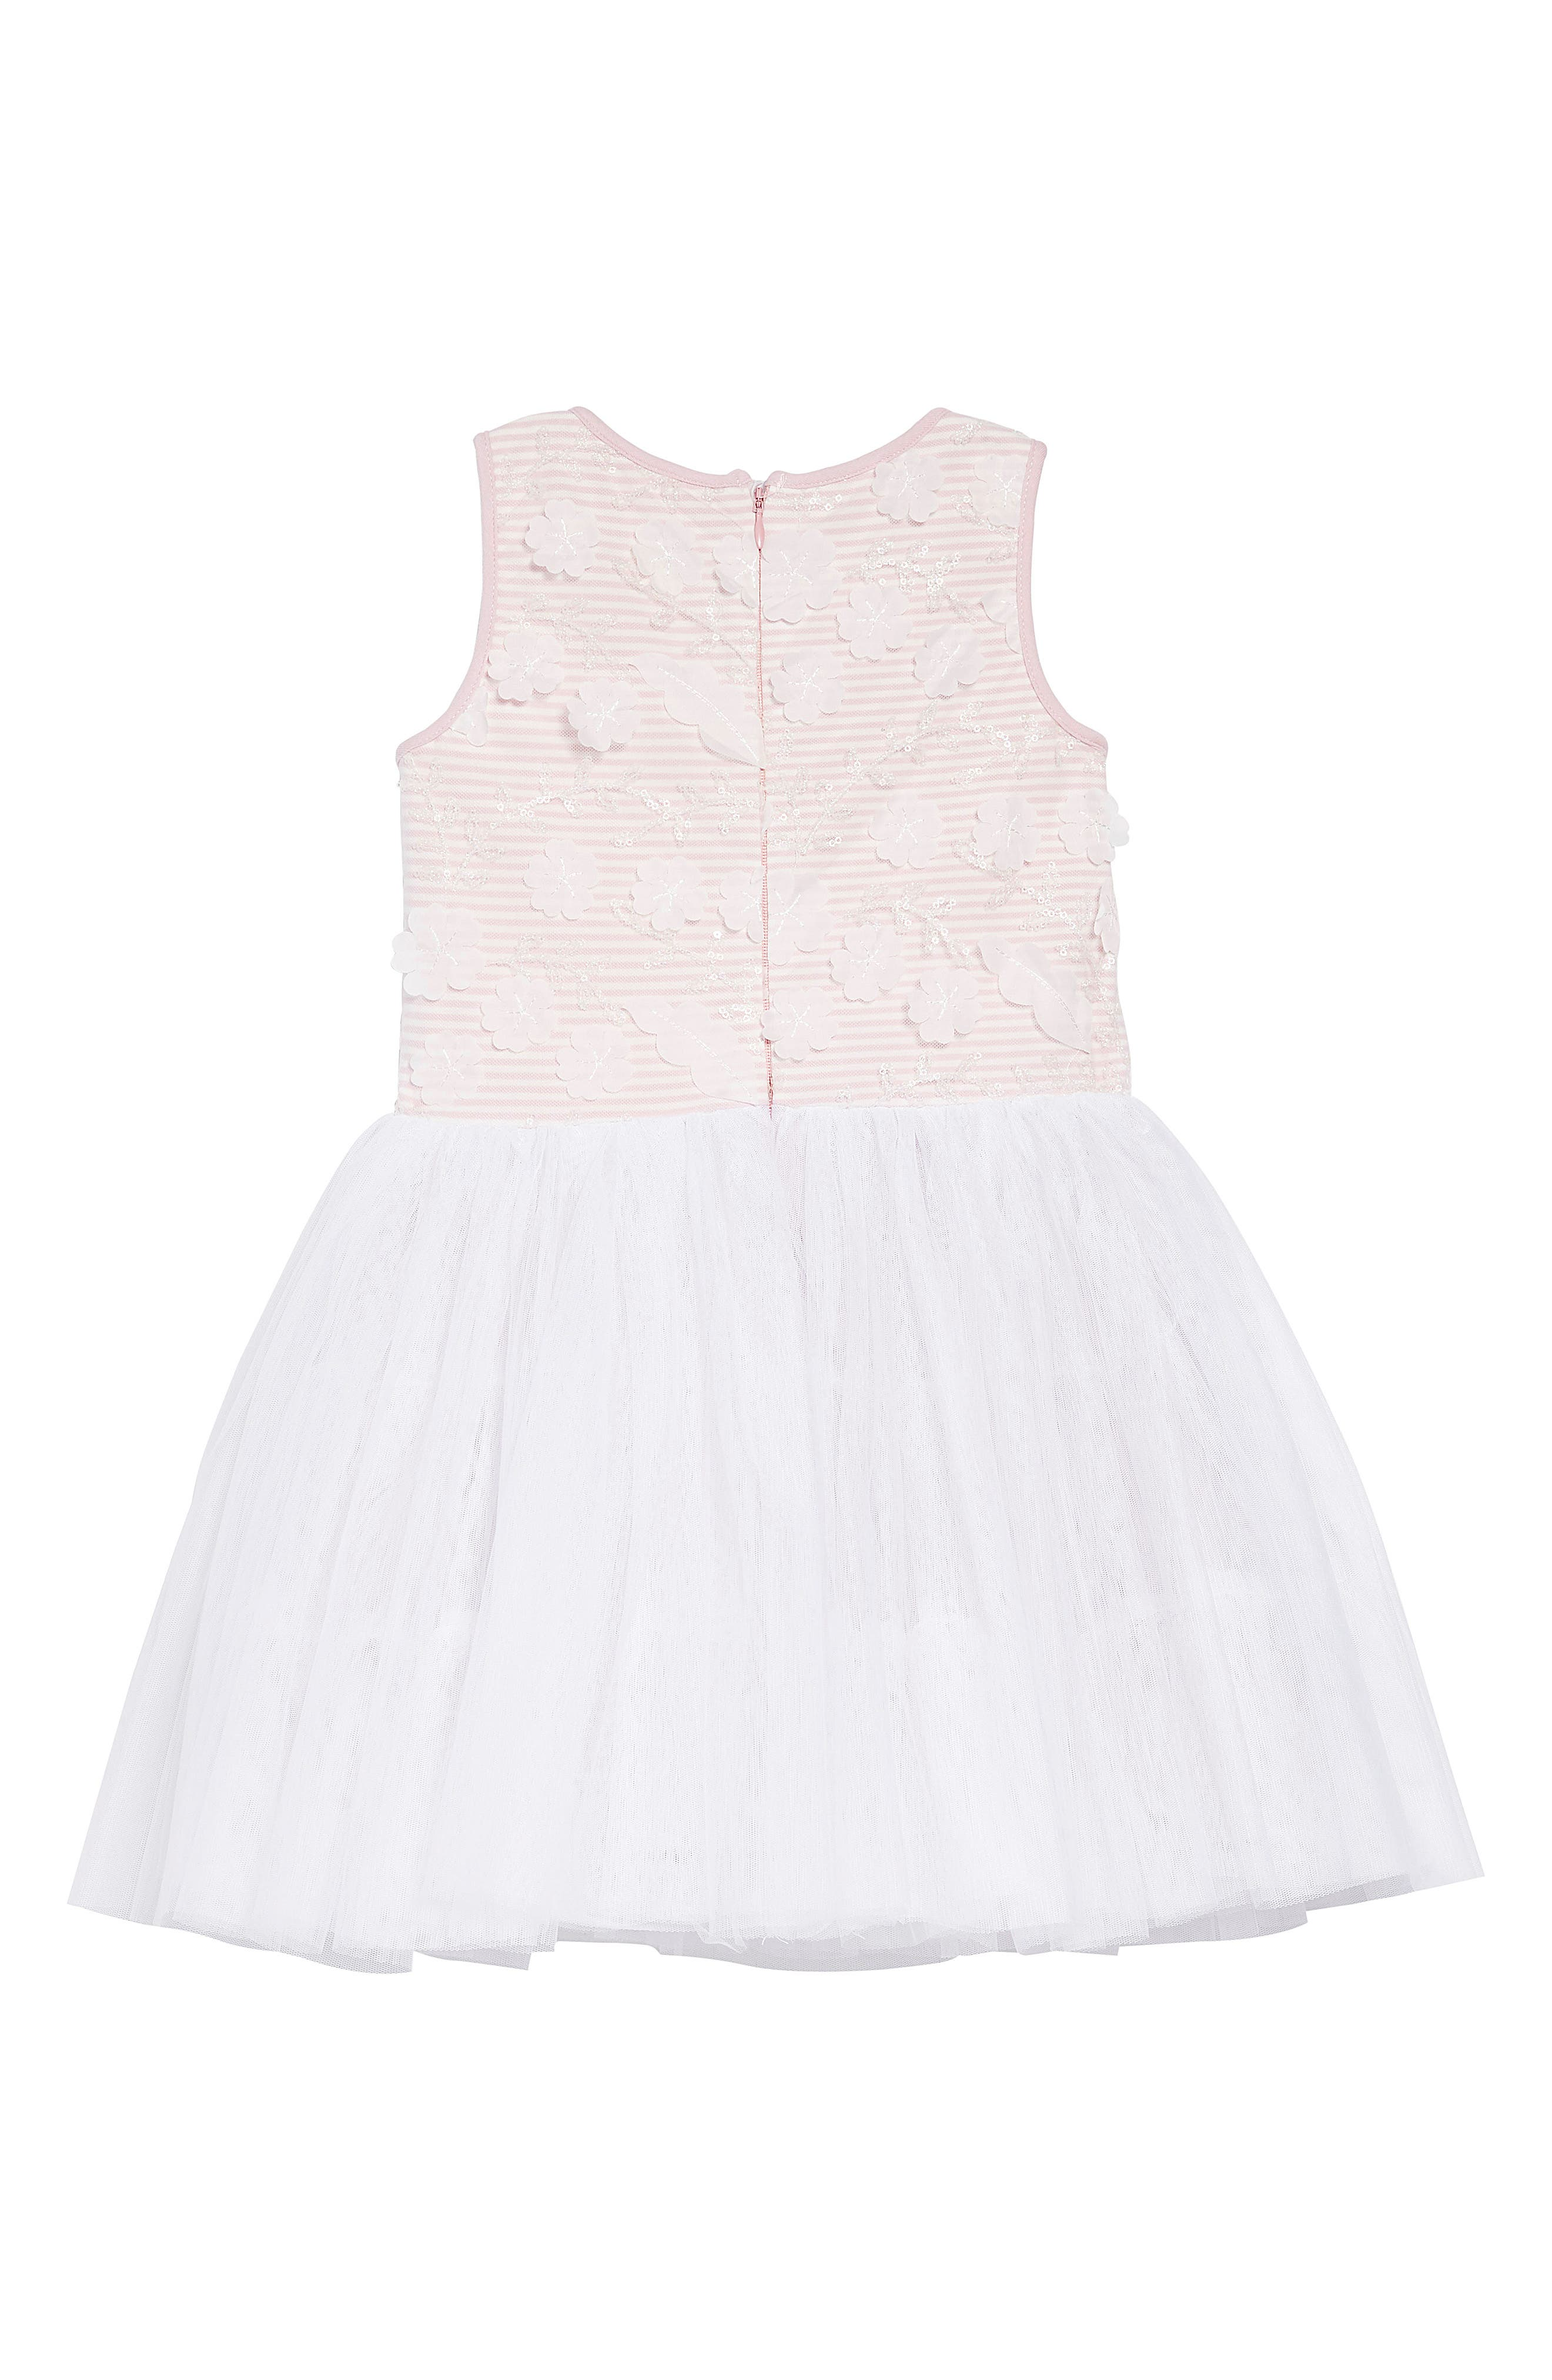 PASTOURELLE BY PIPPA & JULIE, Embellished Bodice Dress, Alternate thumbnail 3, color, 654